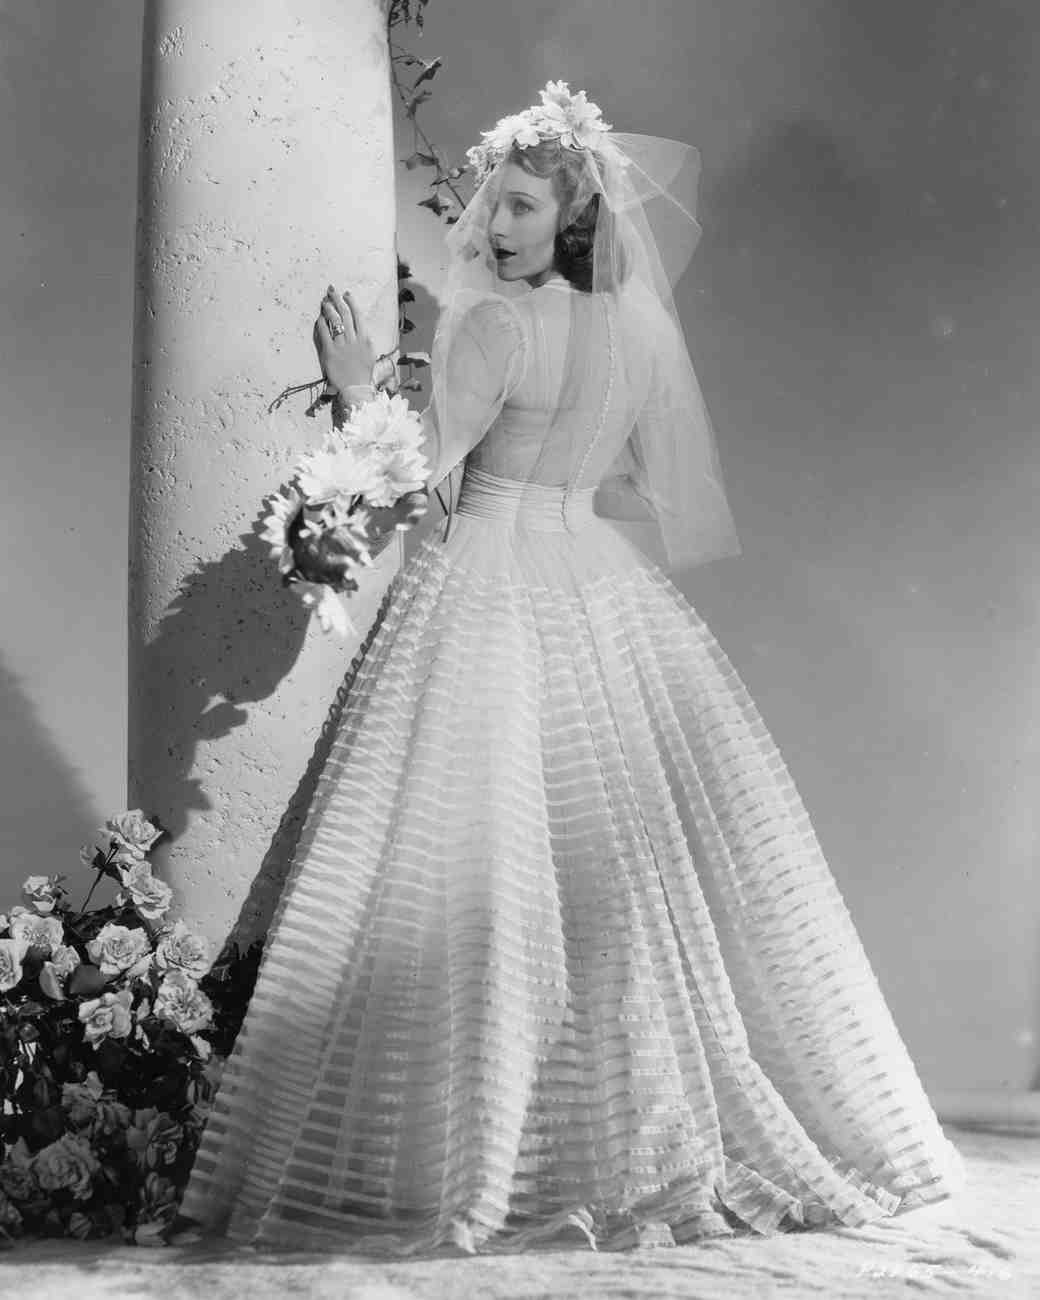 movie-wedding-dresses-paris-honeymoon-shirley-ross-0316.jpg